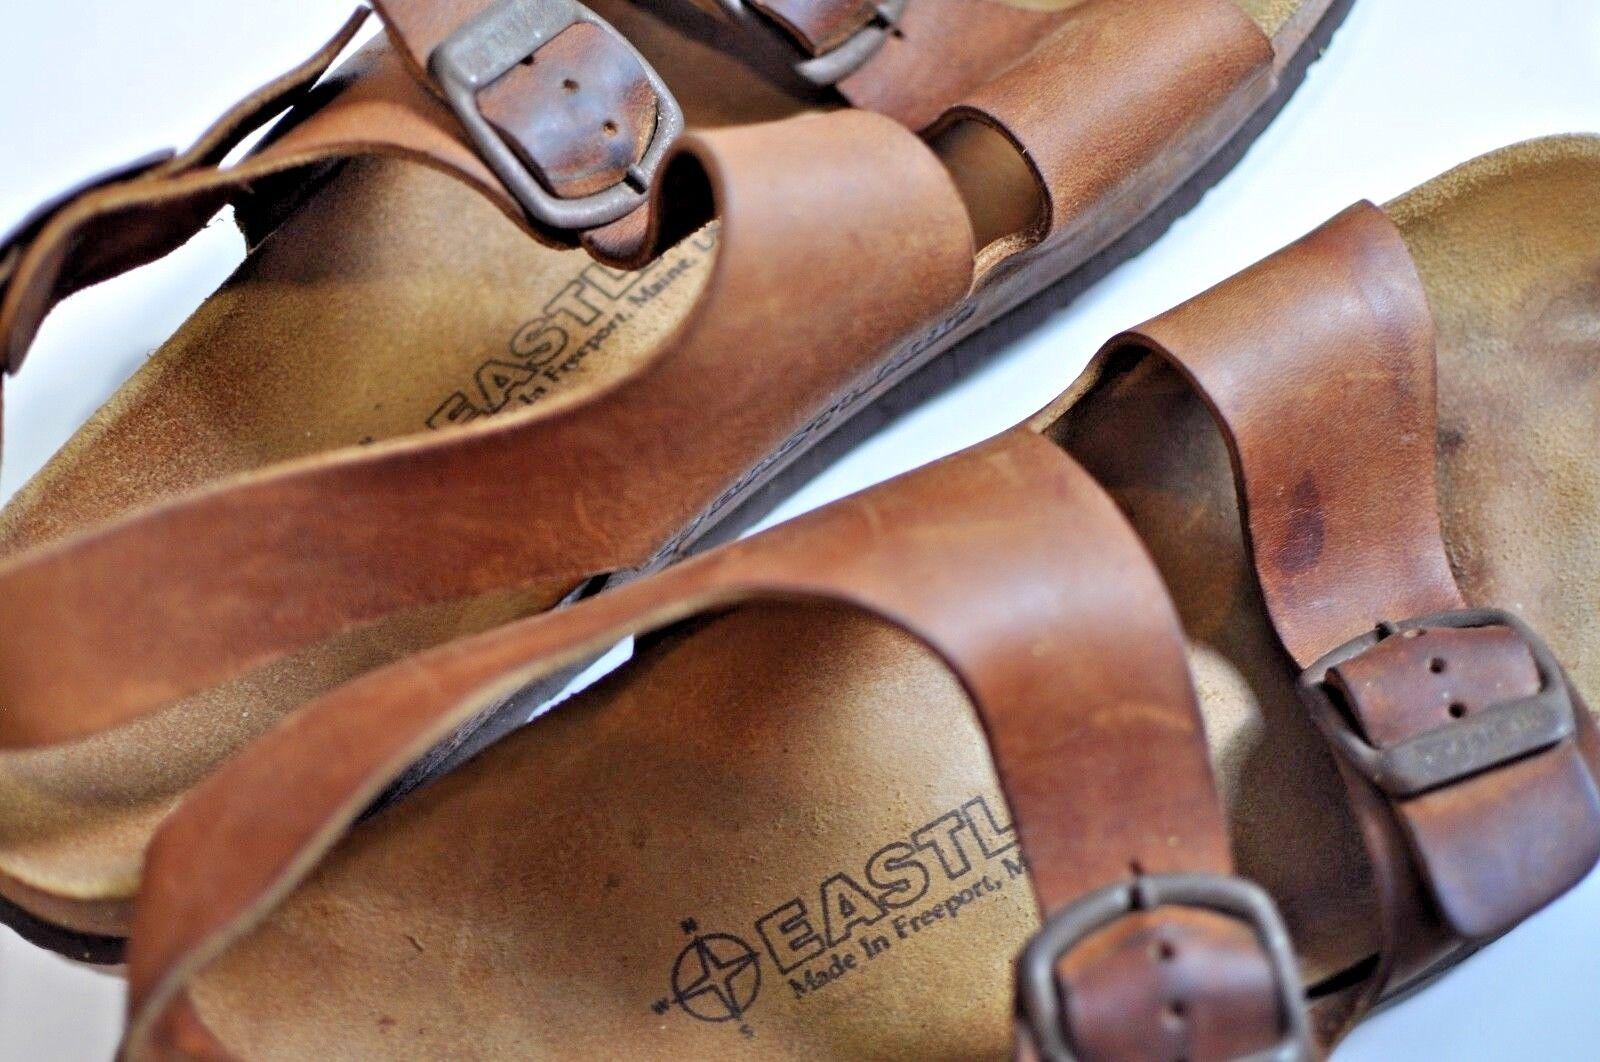 Vintage Eastland Uomo pelle sandals size 12 made in USA